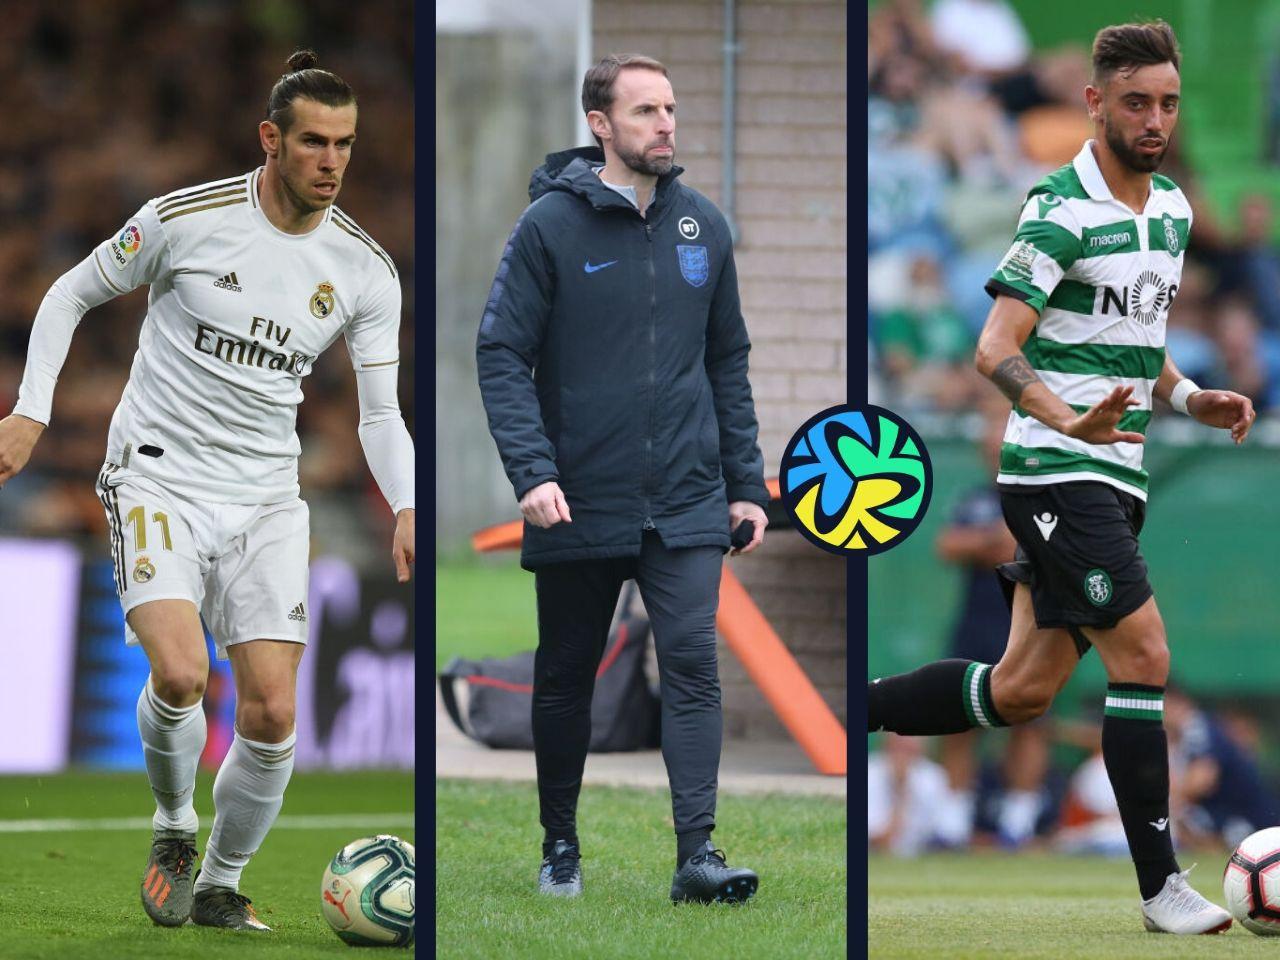 Bruno Fernandes, Garth bale, Gareth Southgate